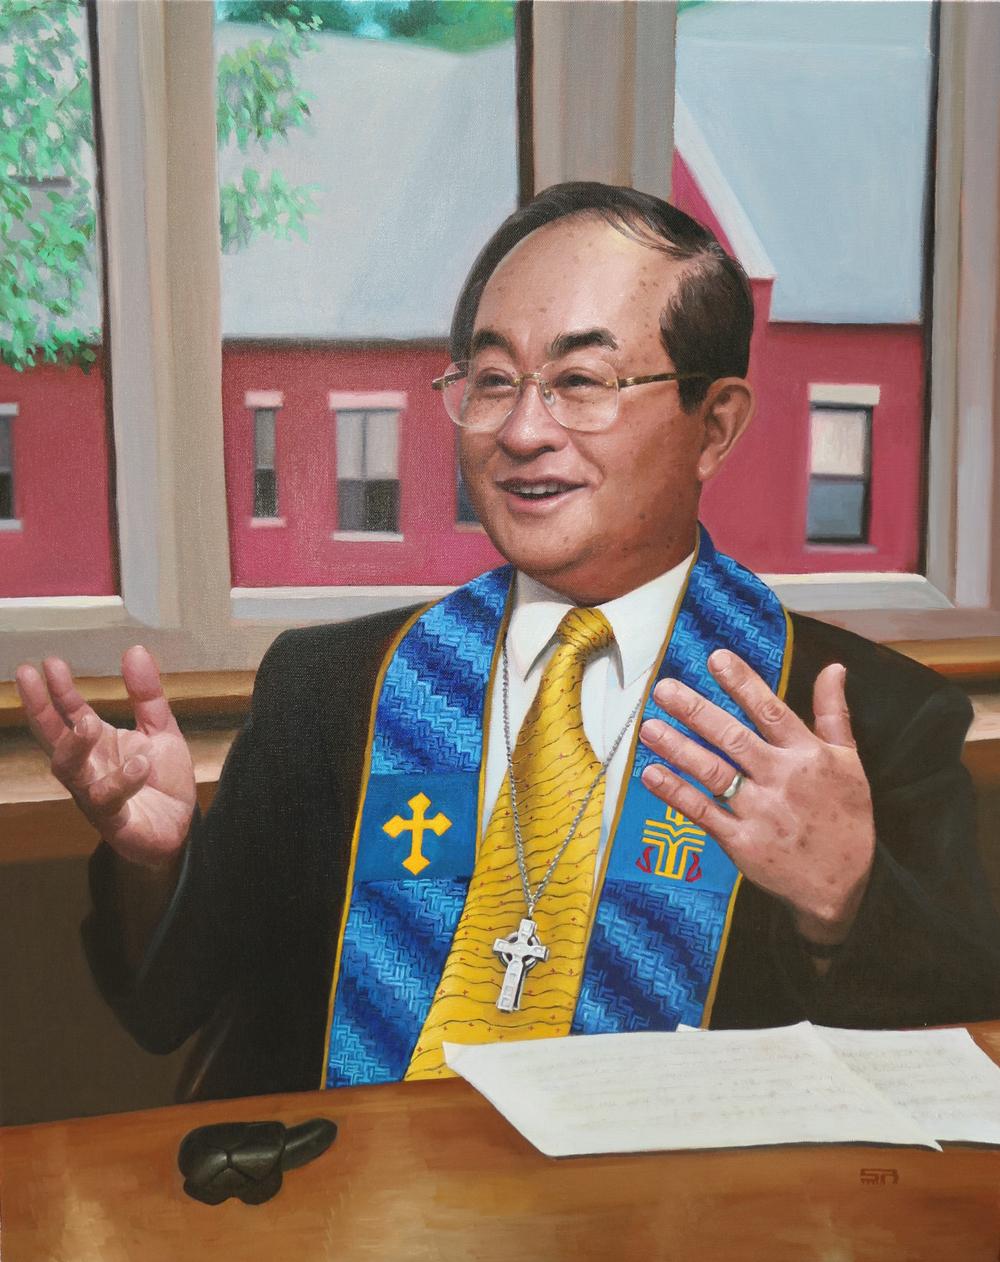 Dr. & Rev. Syngman Rhee 1931-2015